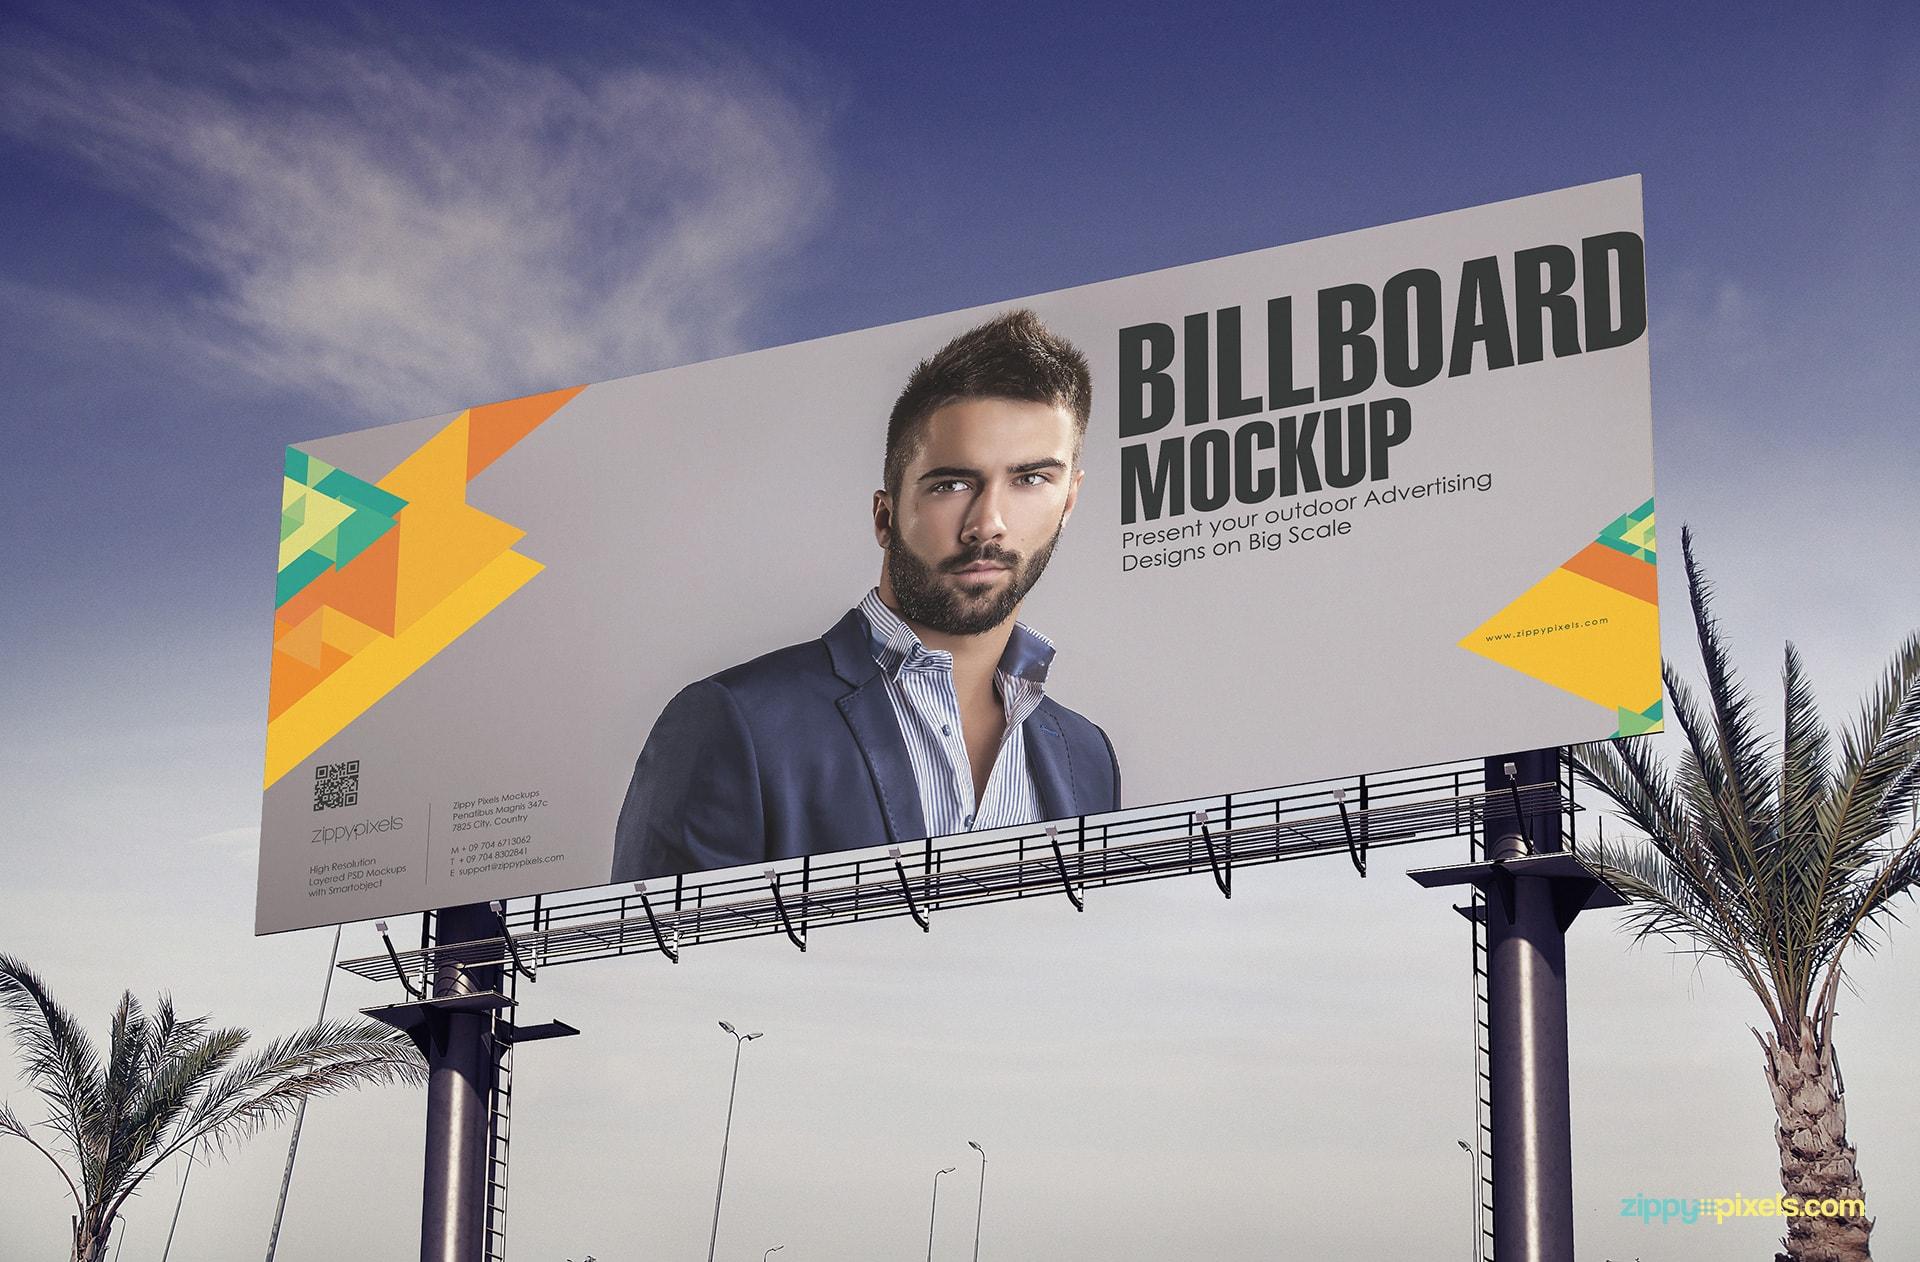 Billboard Mockup - Closeup low angle view of large billboard